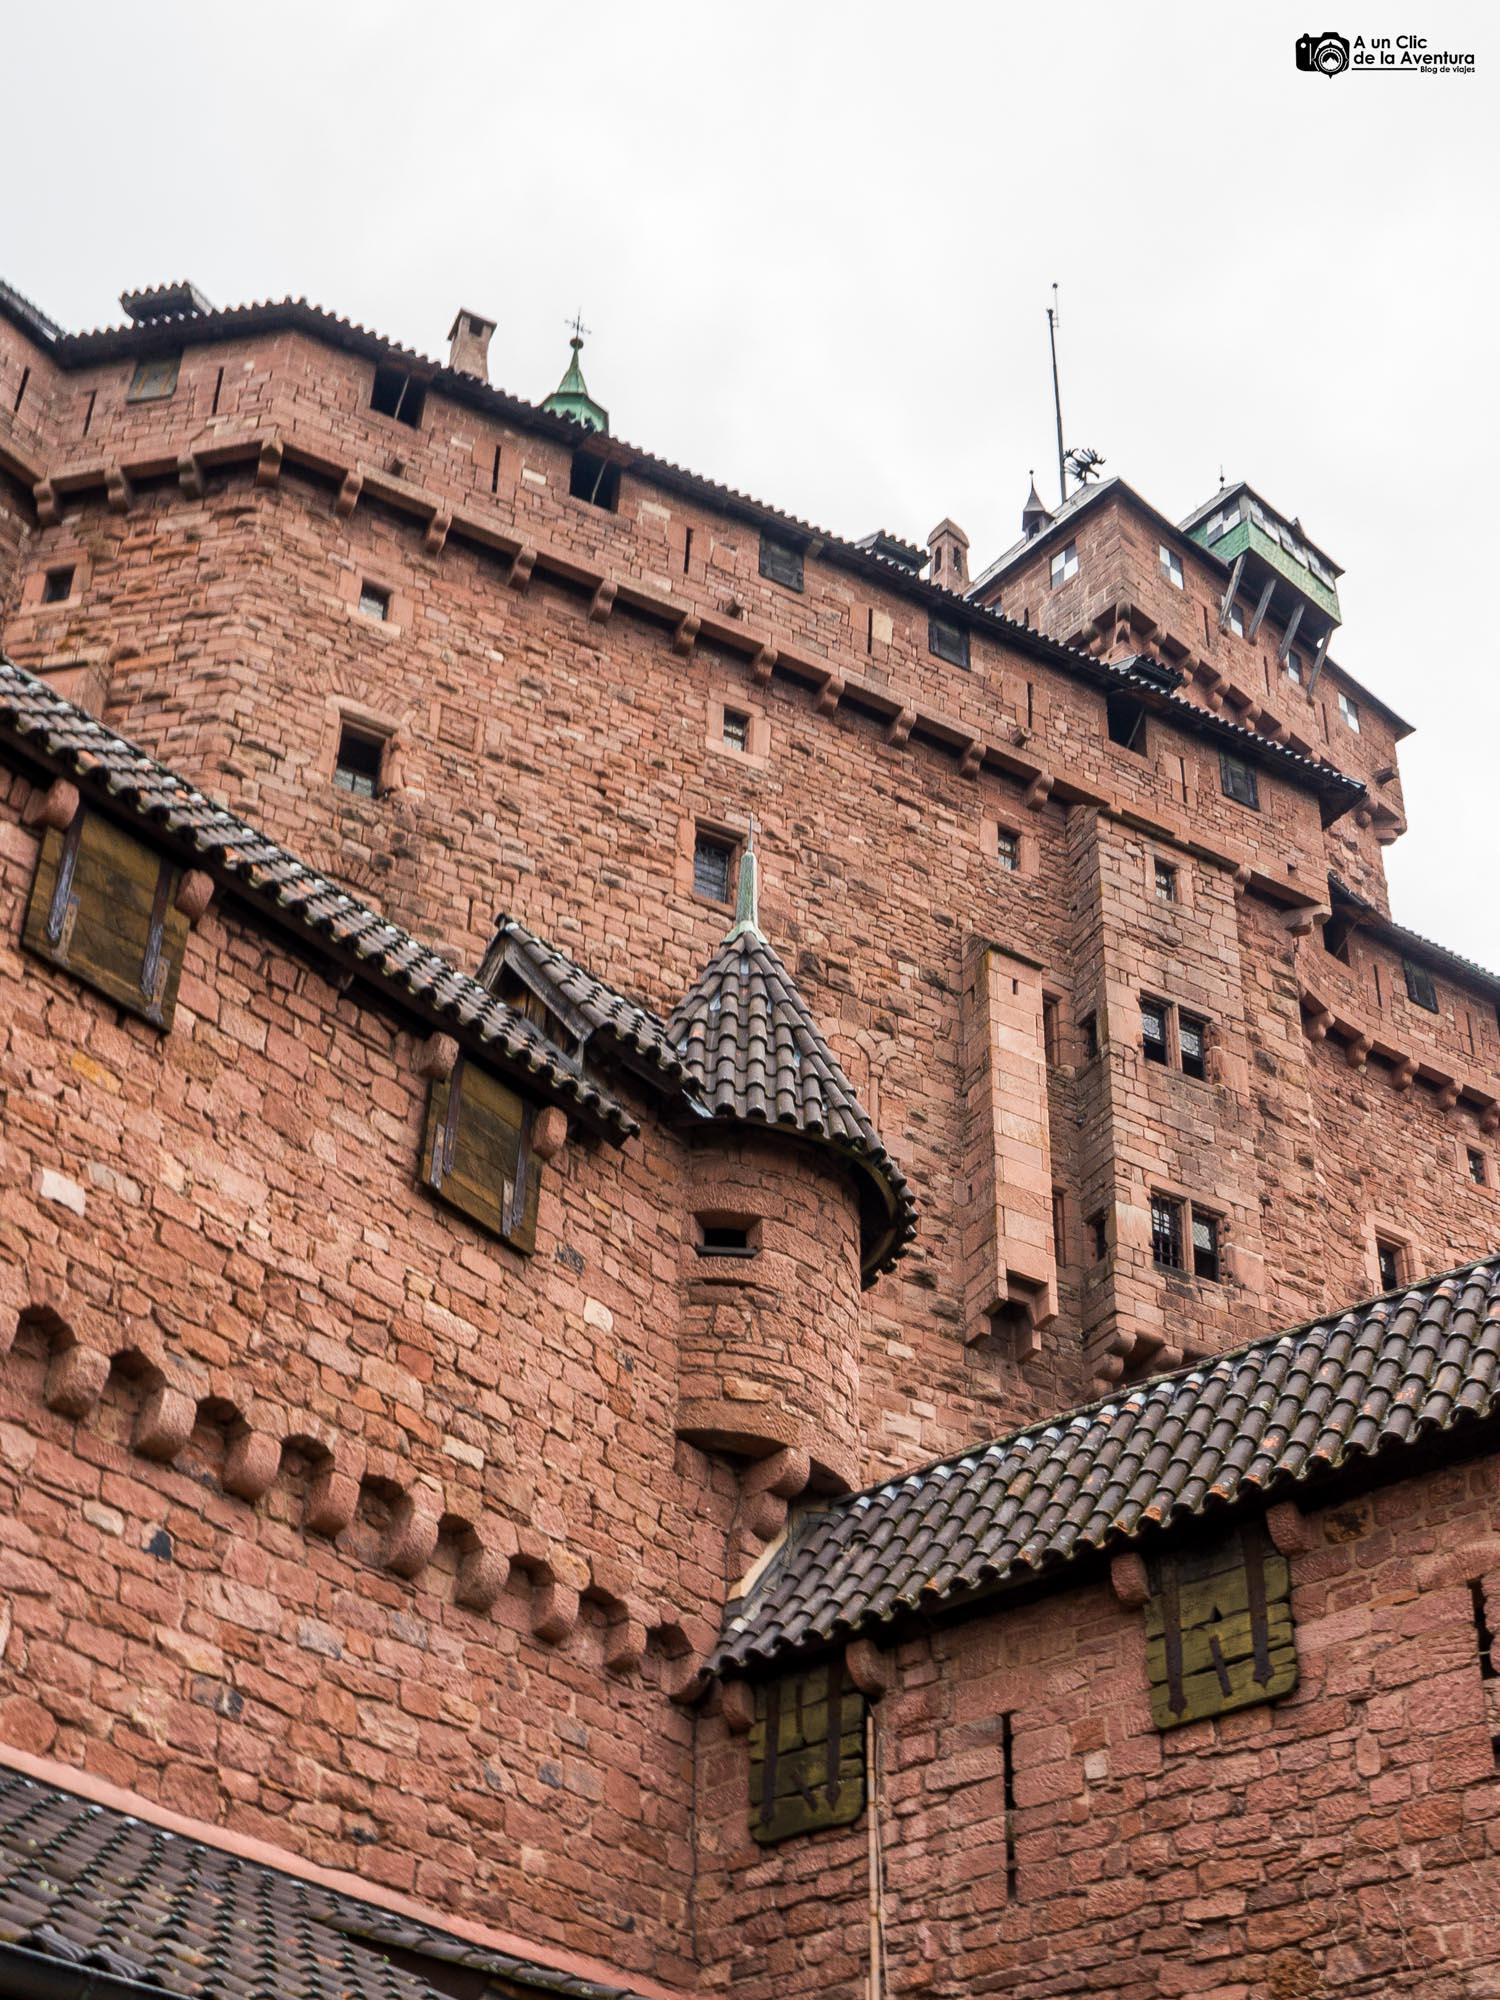 Exterior de la vivienda del Señor del Castillo de Haut-Koenigsbourg